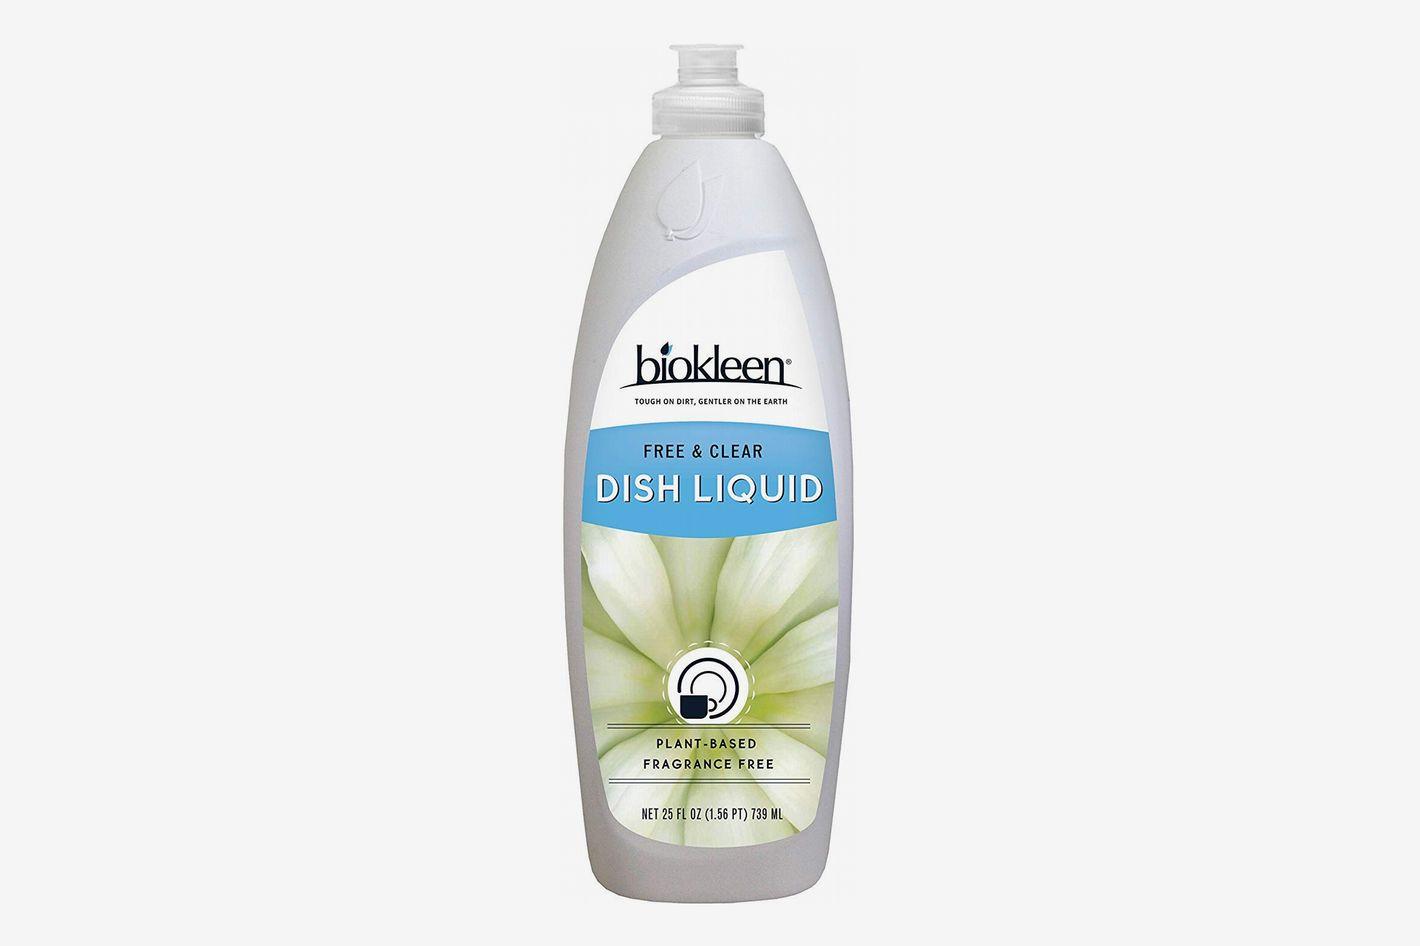 Biokleen Free and Clean Dish Liquid Soap